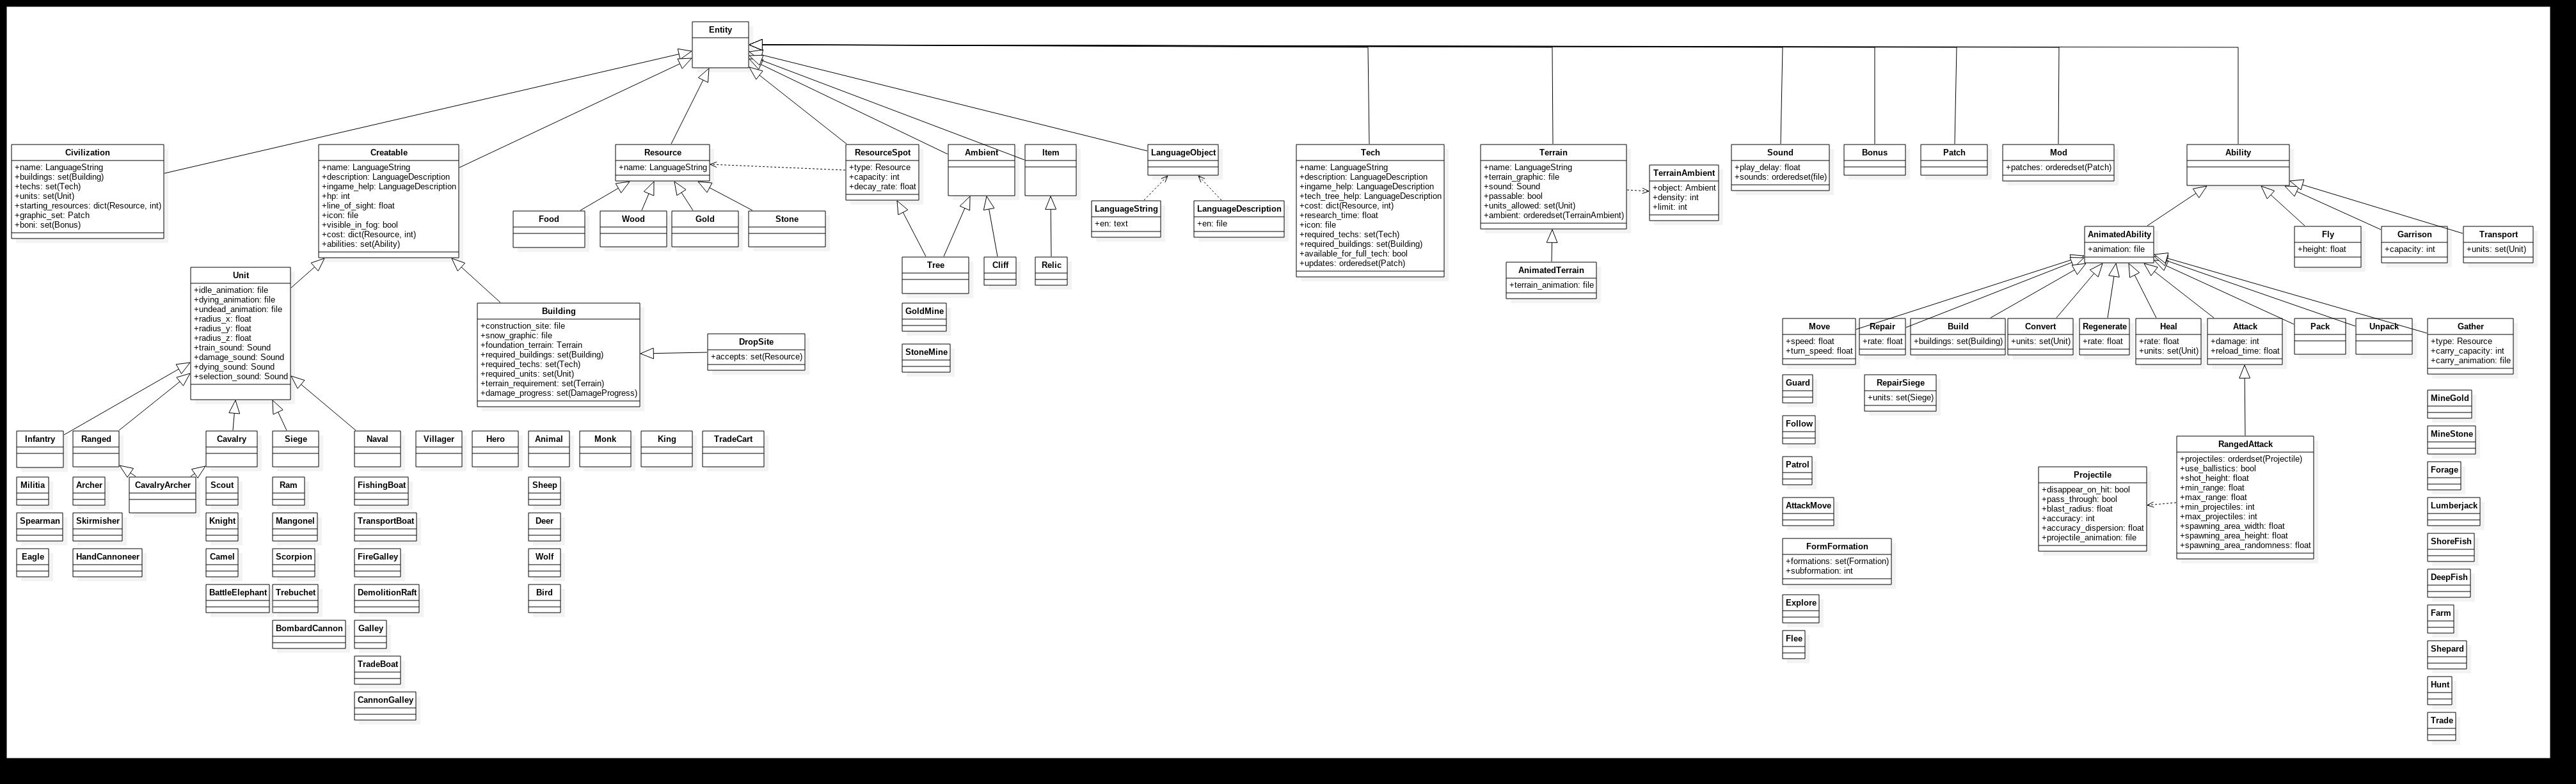 API draft 1